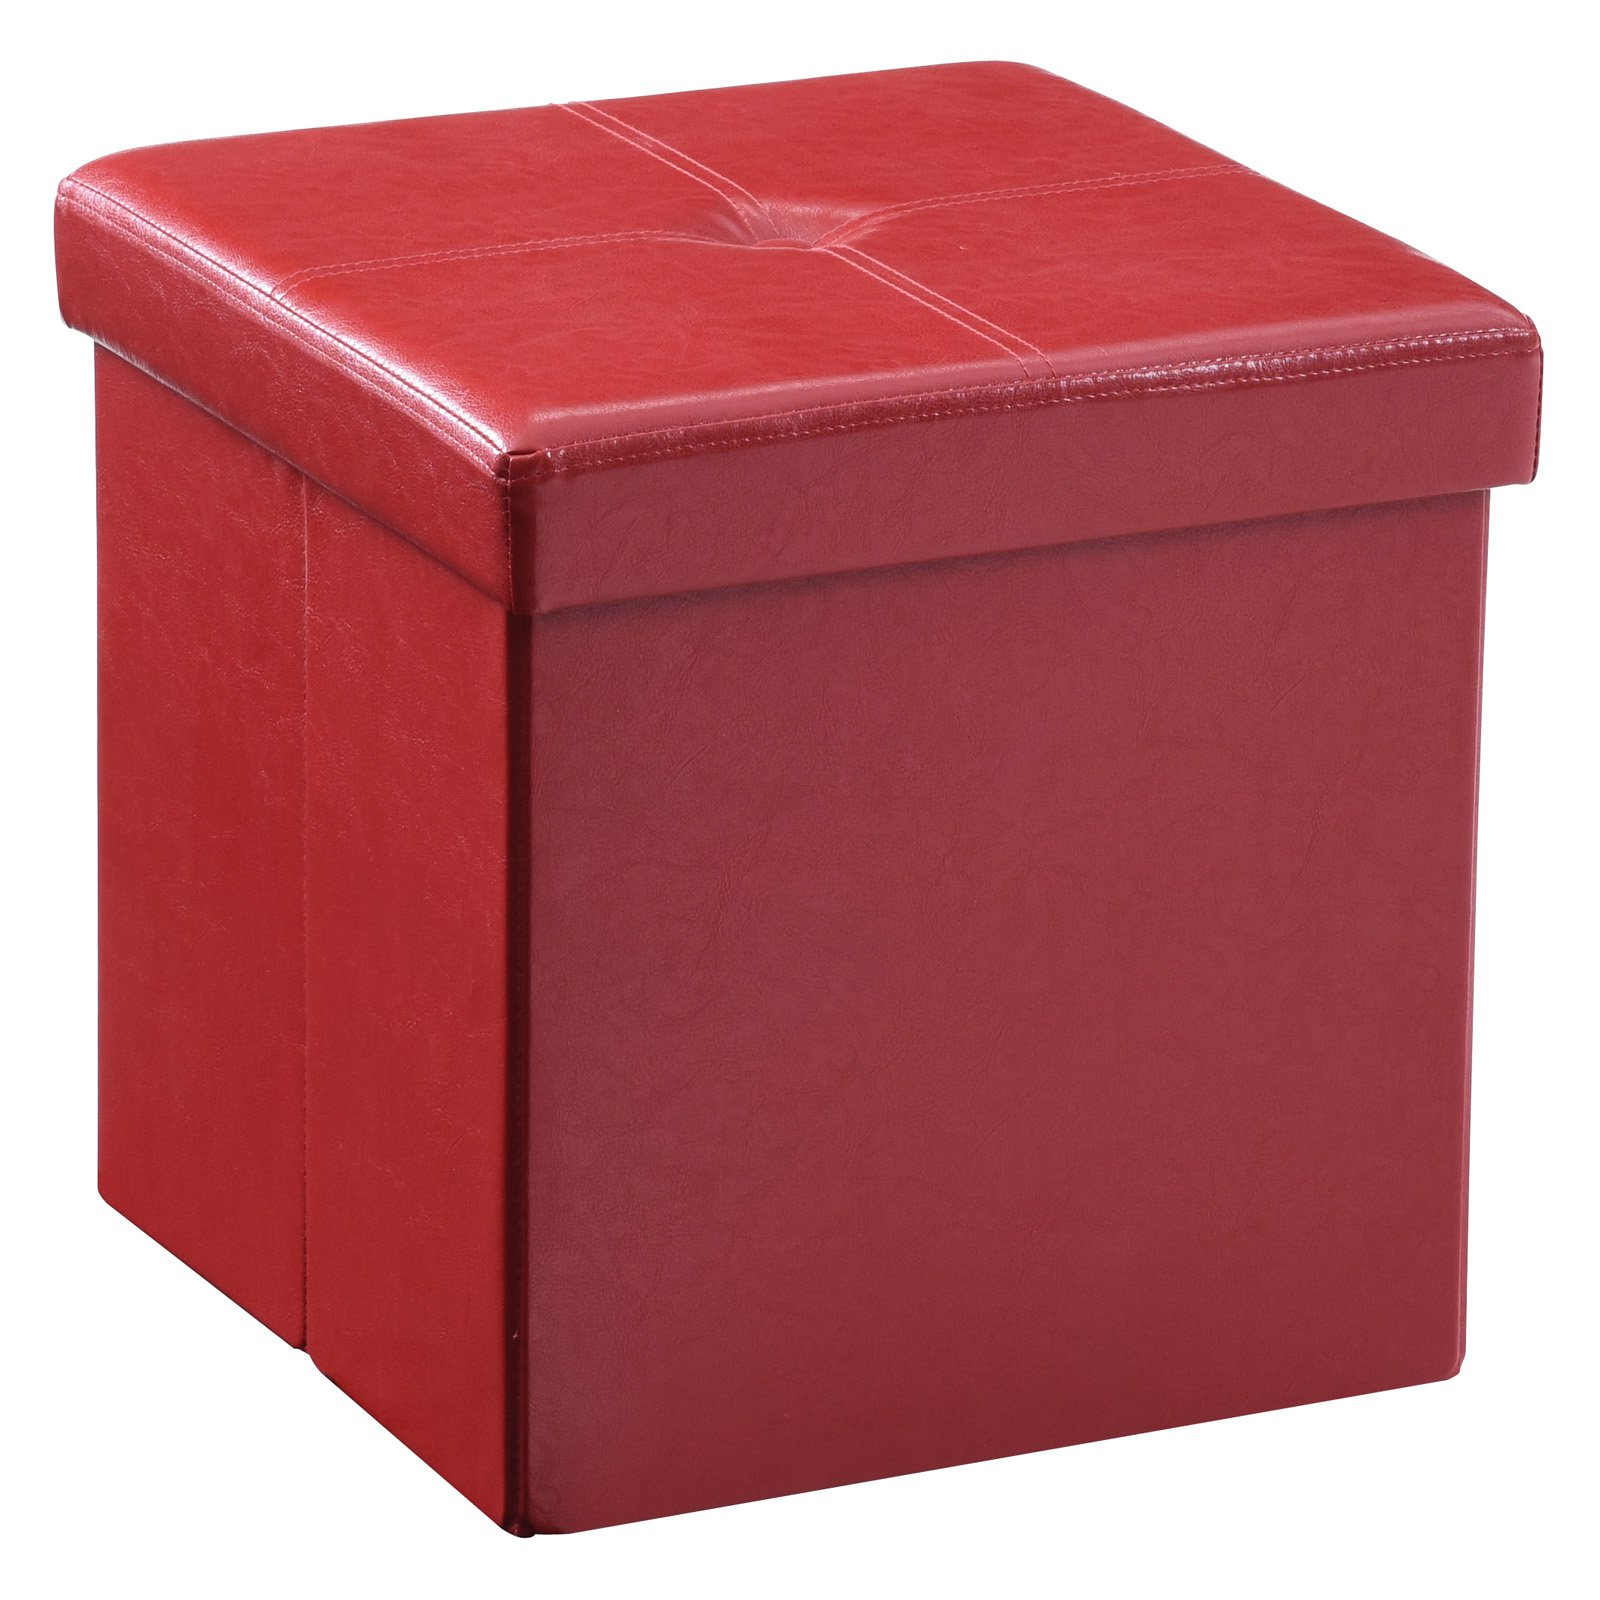 Hodedah Imports Cube Storage Ottoman